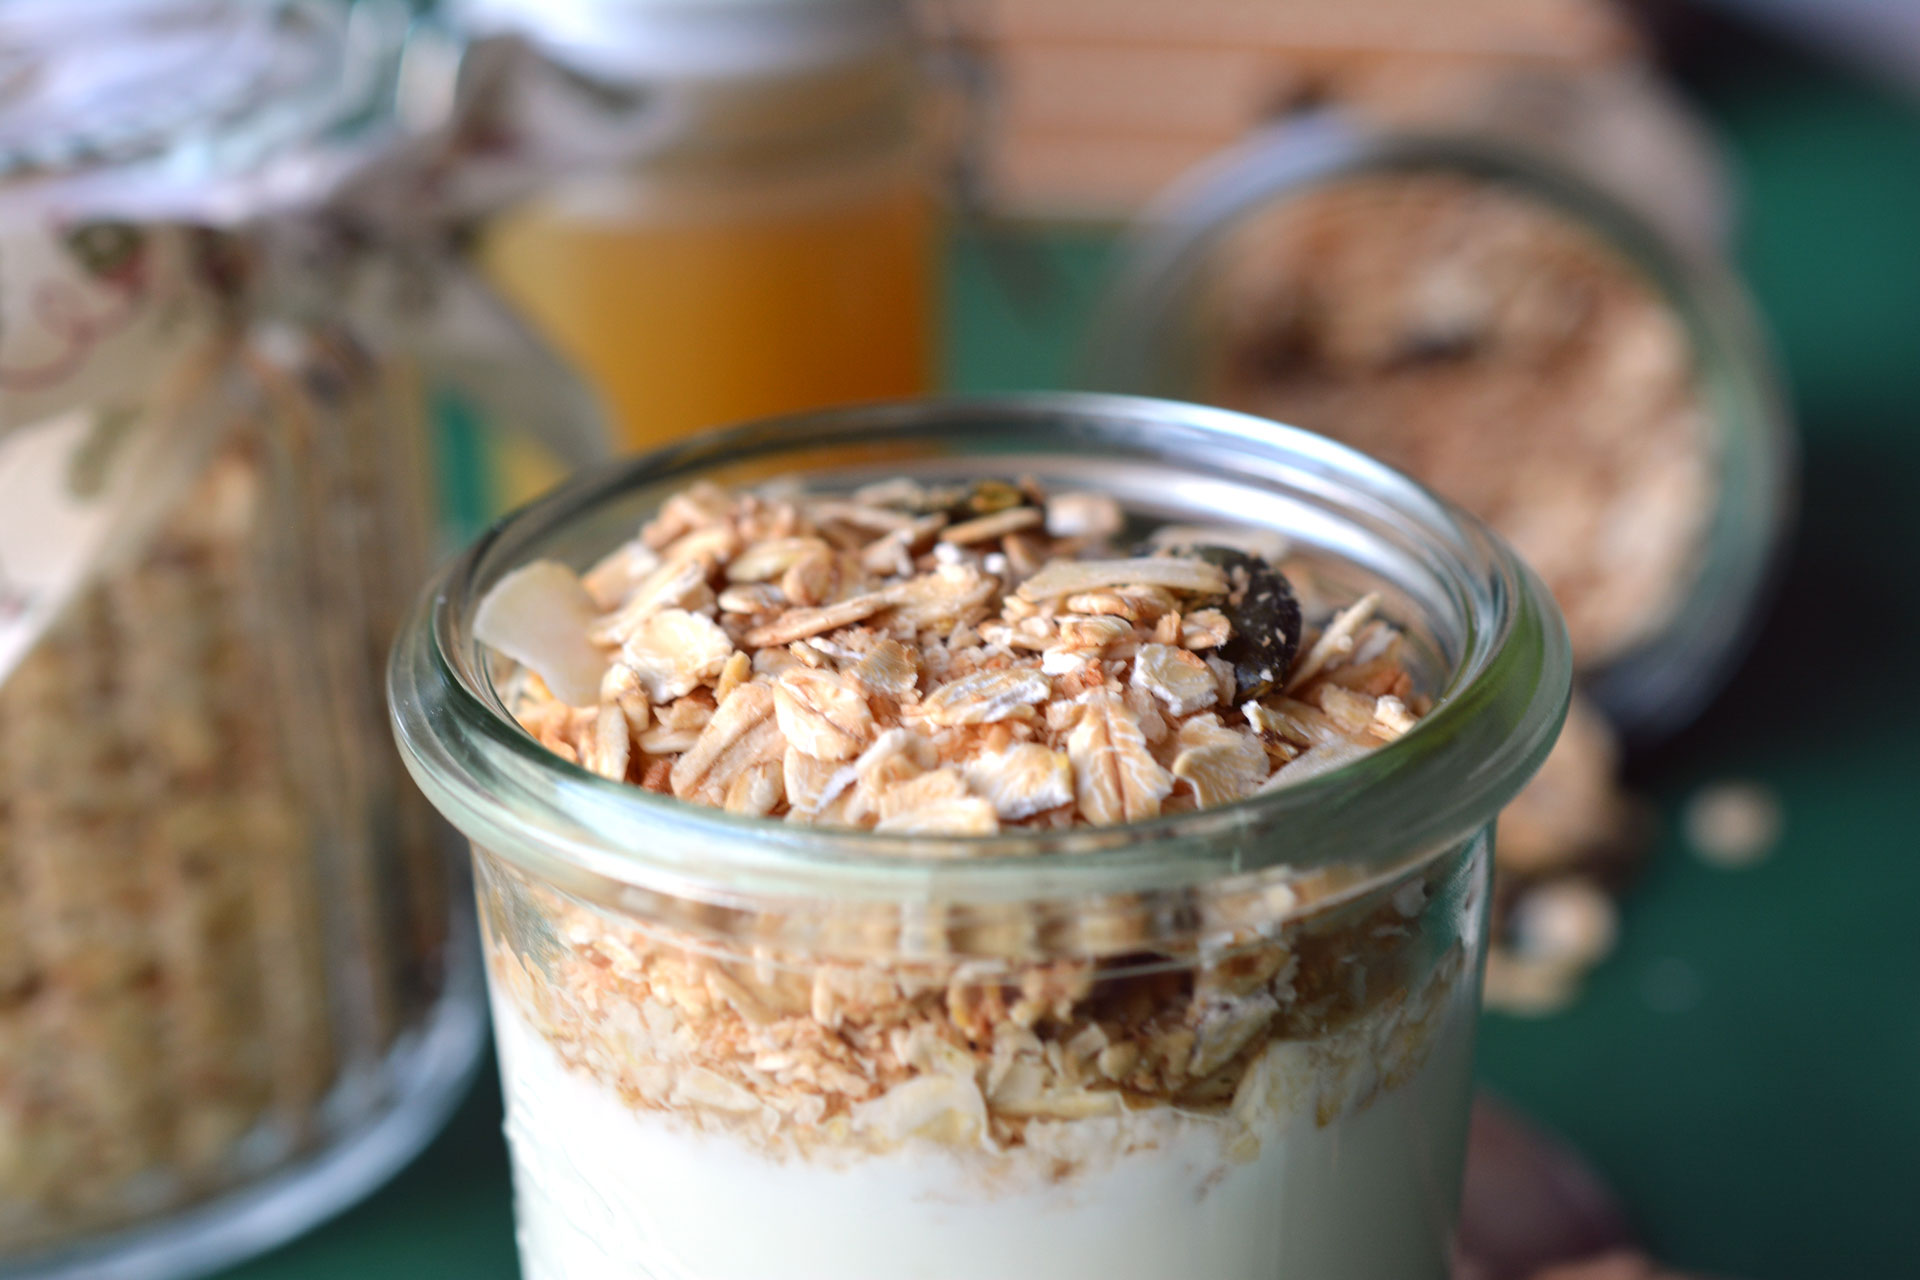 Homemade Granola und Apfel-Kardamom-Marmelade